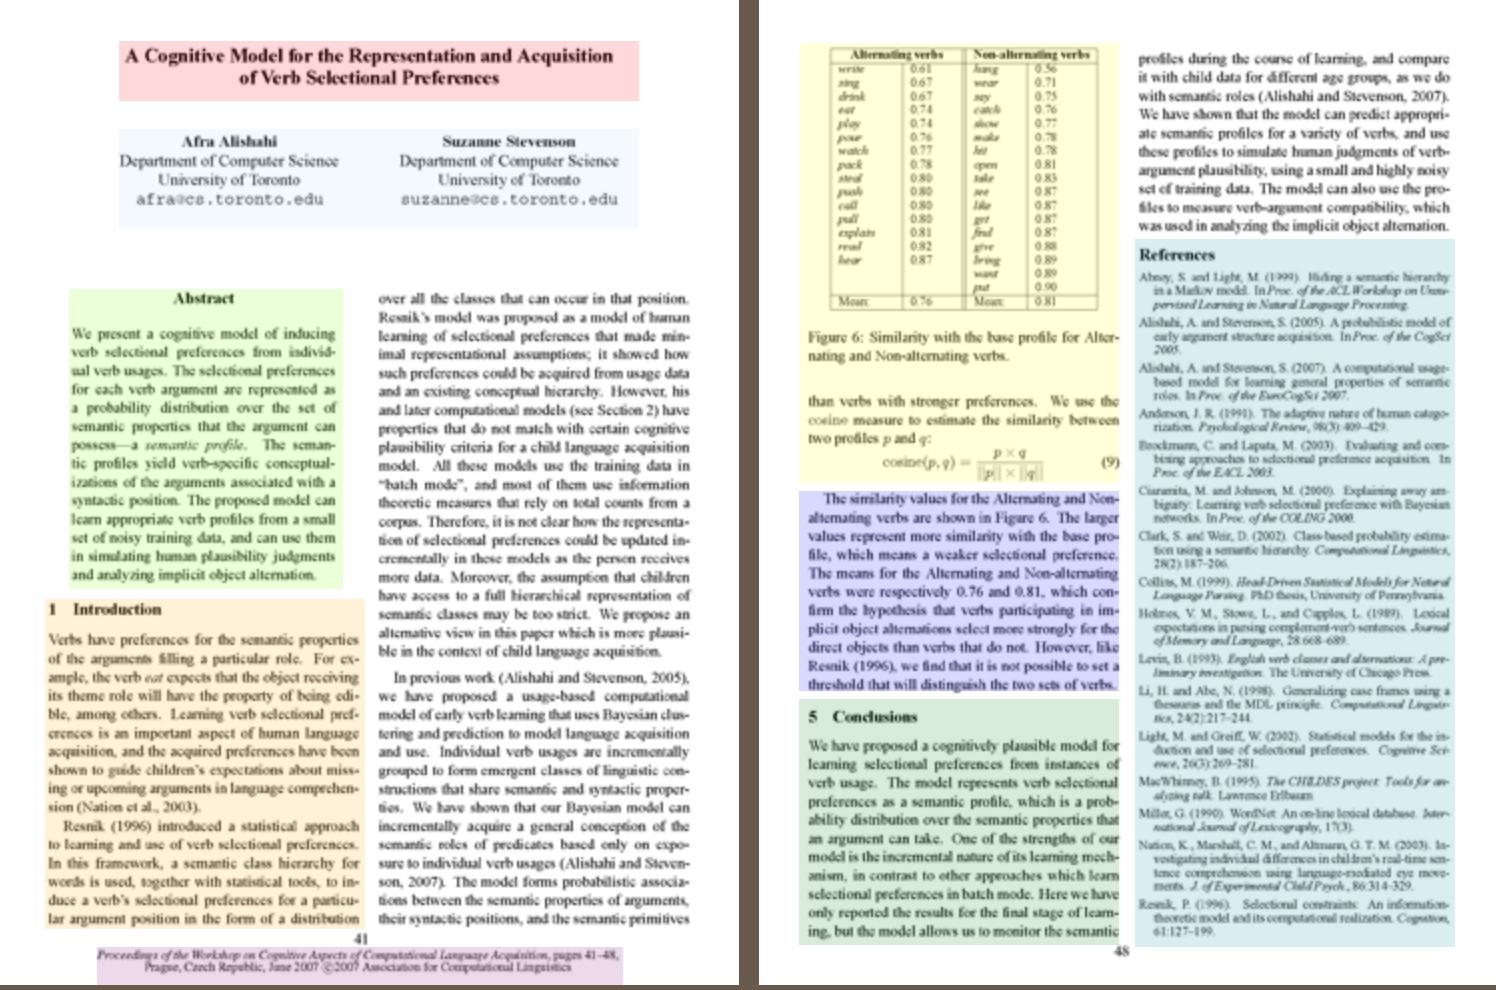 https://www.lib.ncsu.edu/tutorials/scholarly-articles/